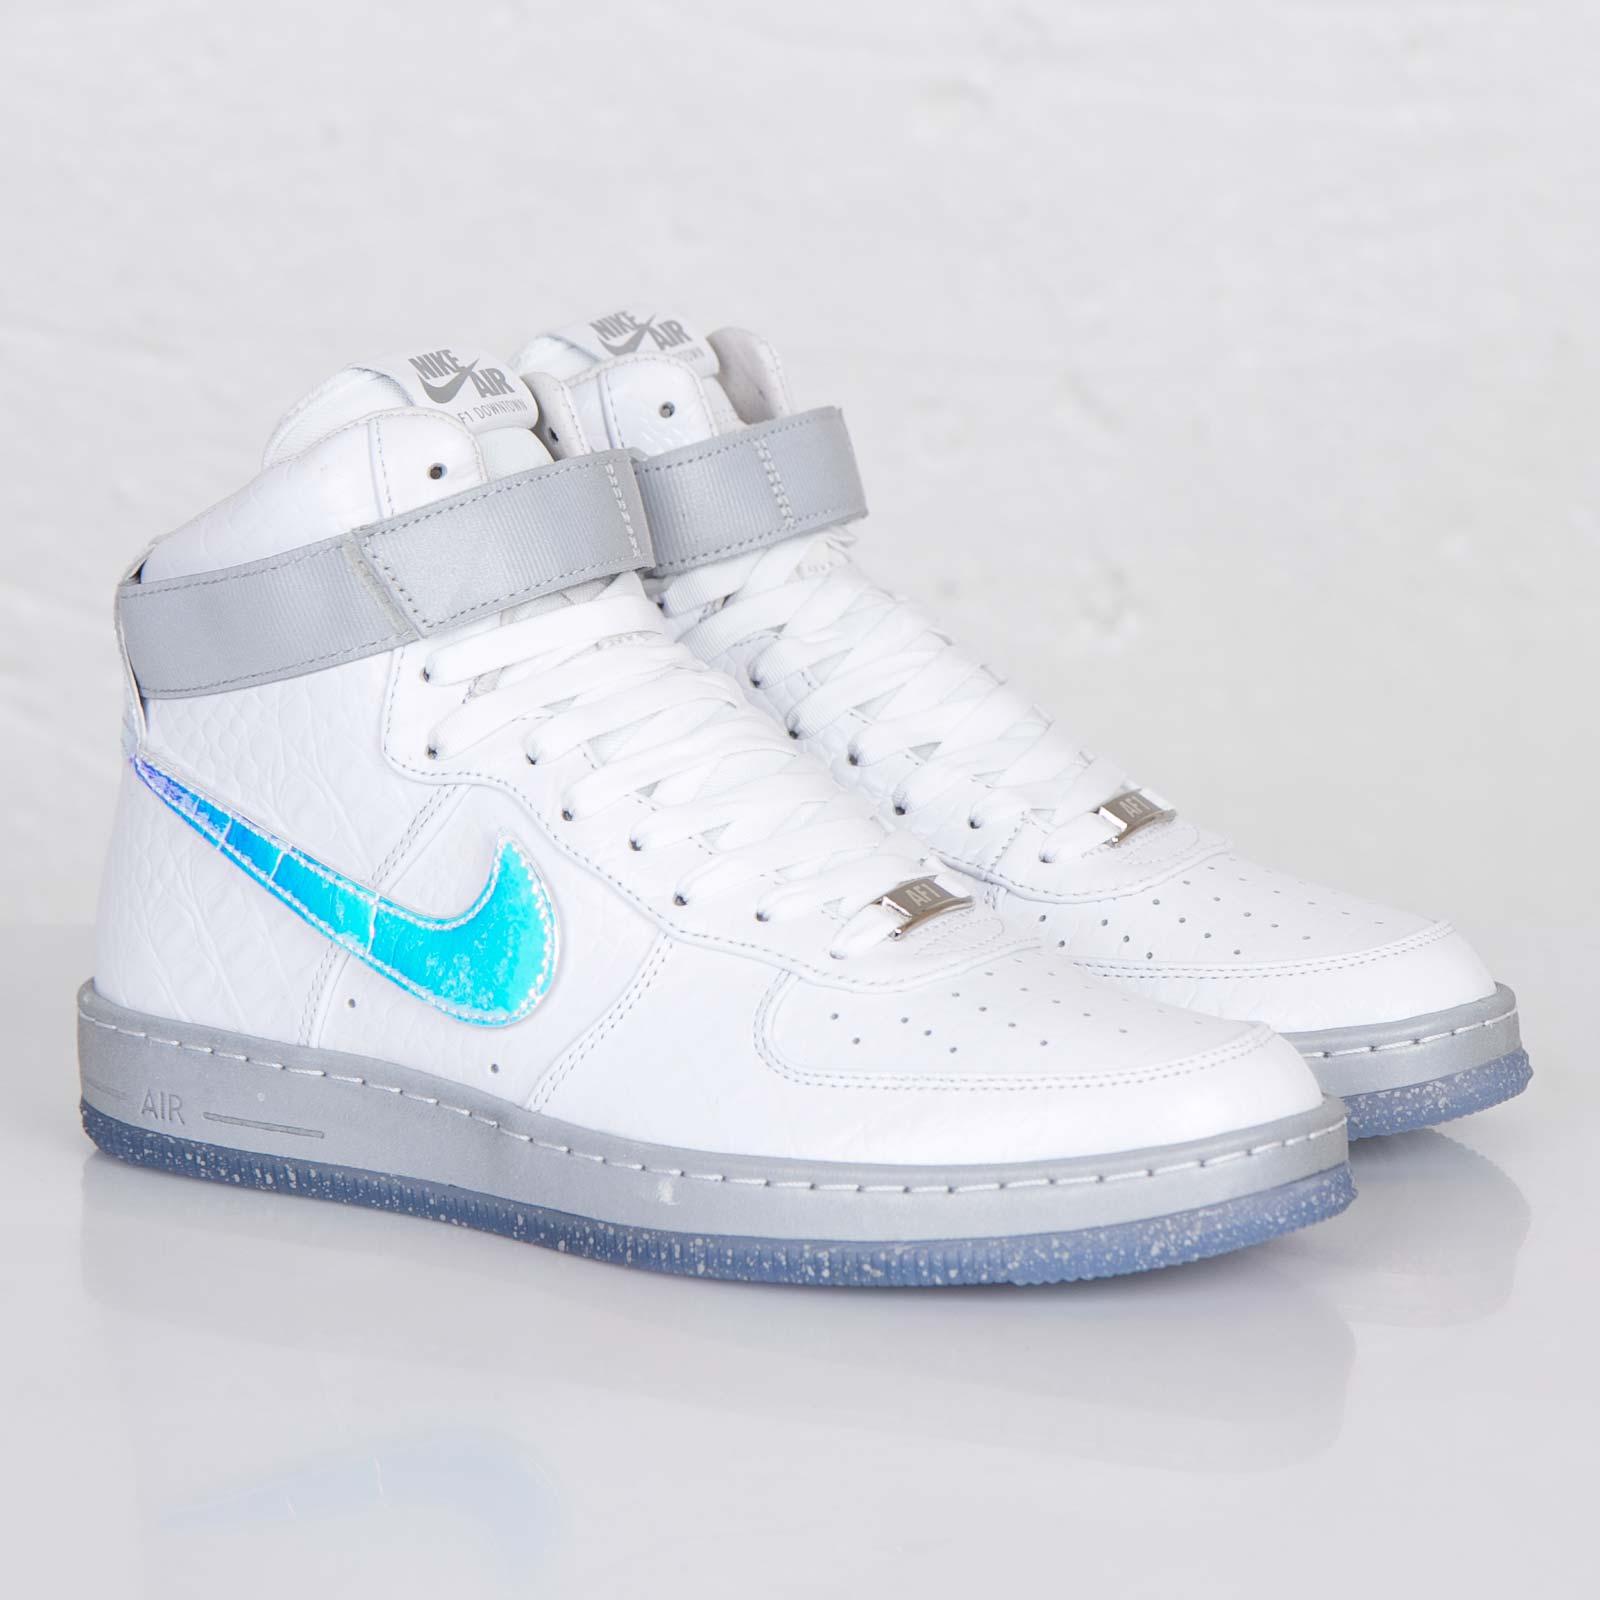 best service e6b21 4597d Nike Air Force 1 Downtown Hi LW QS